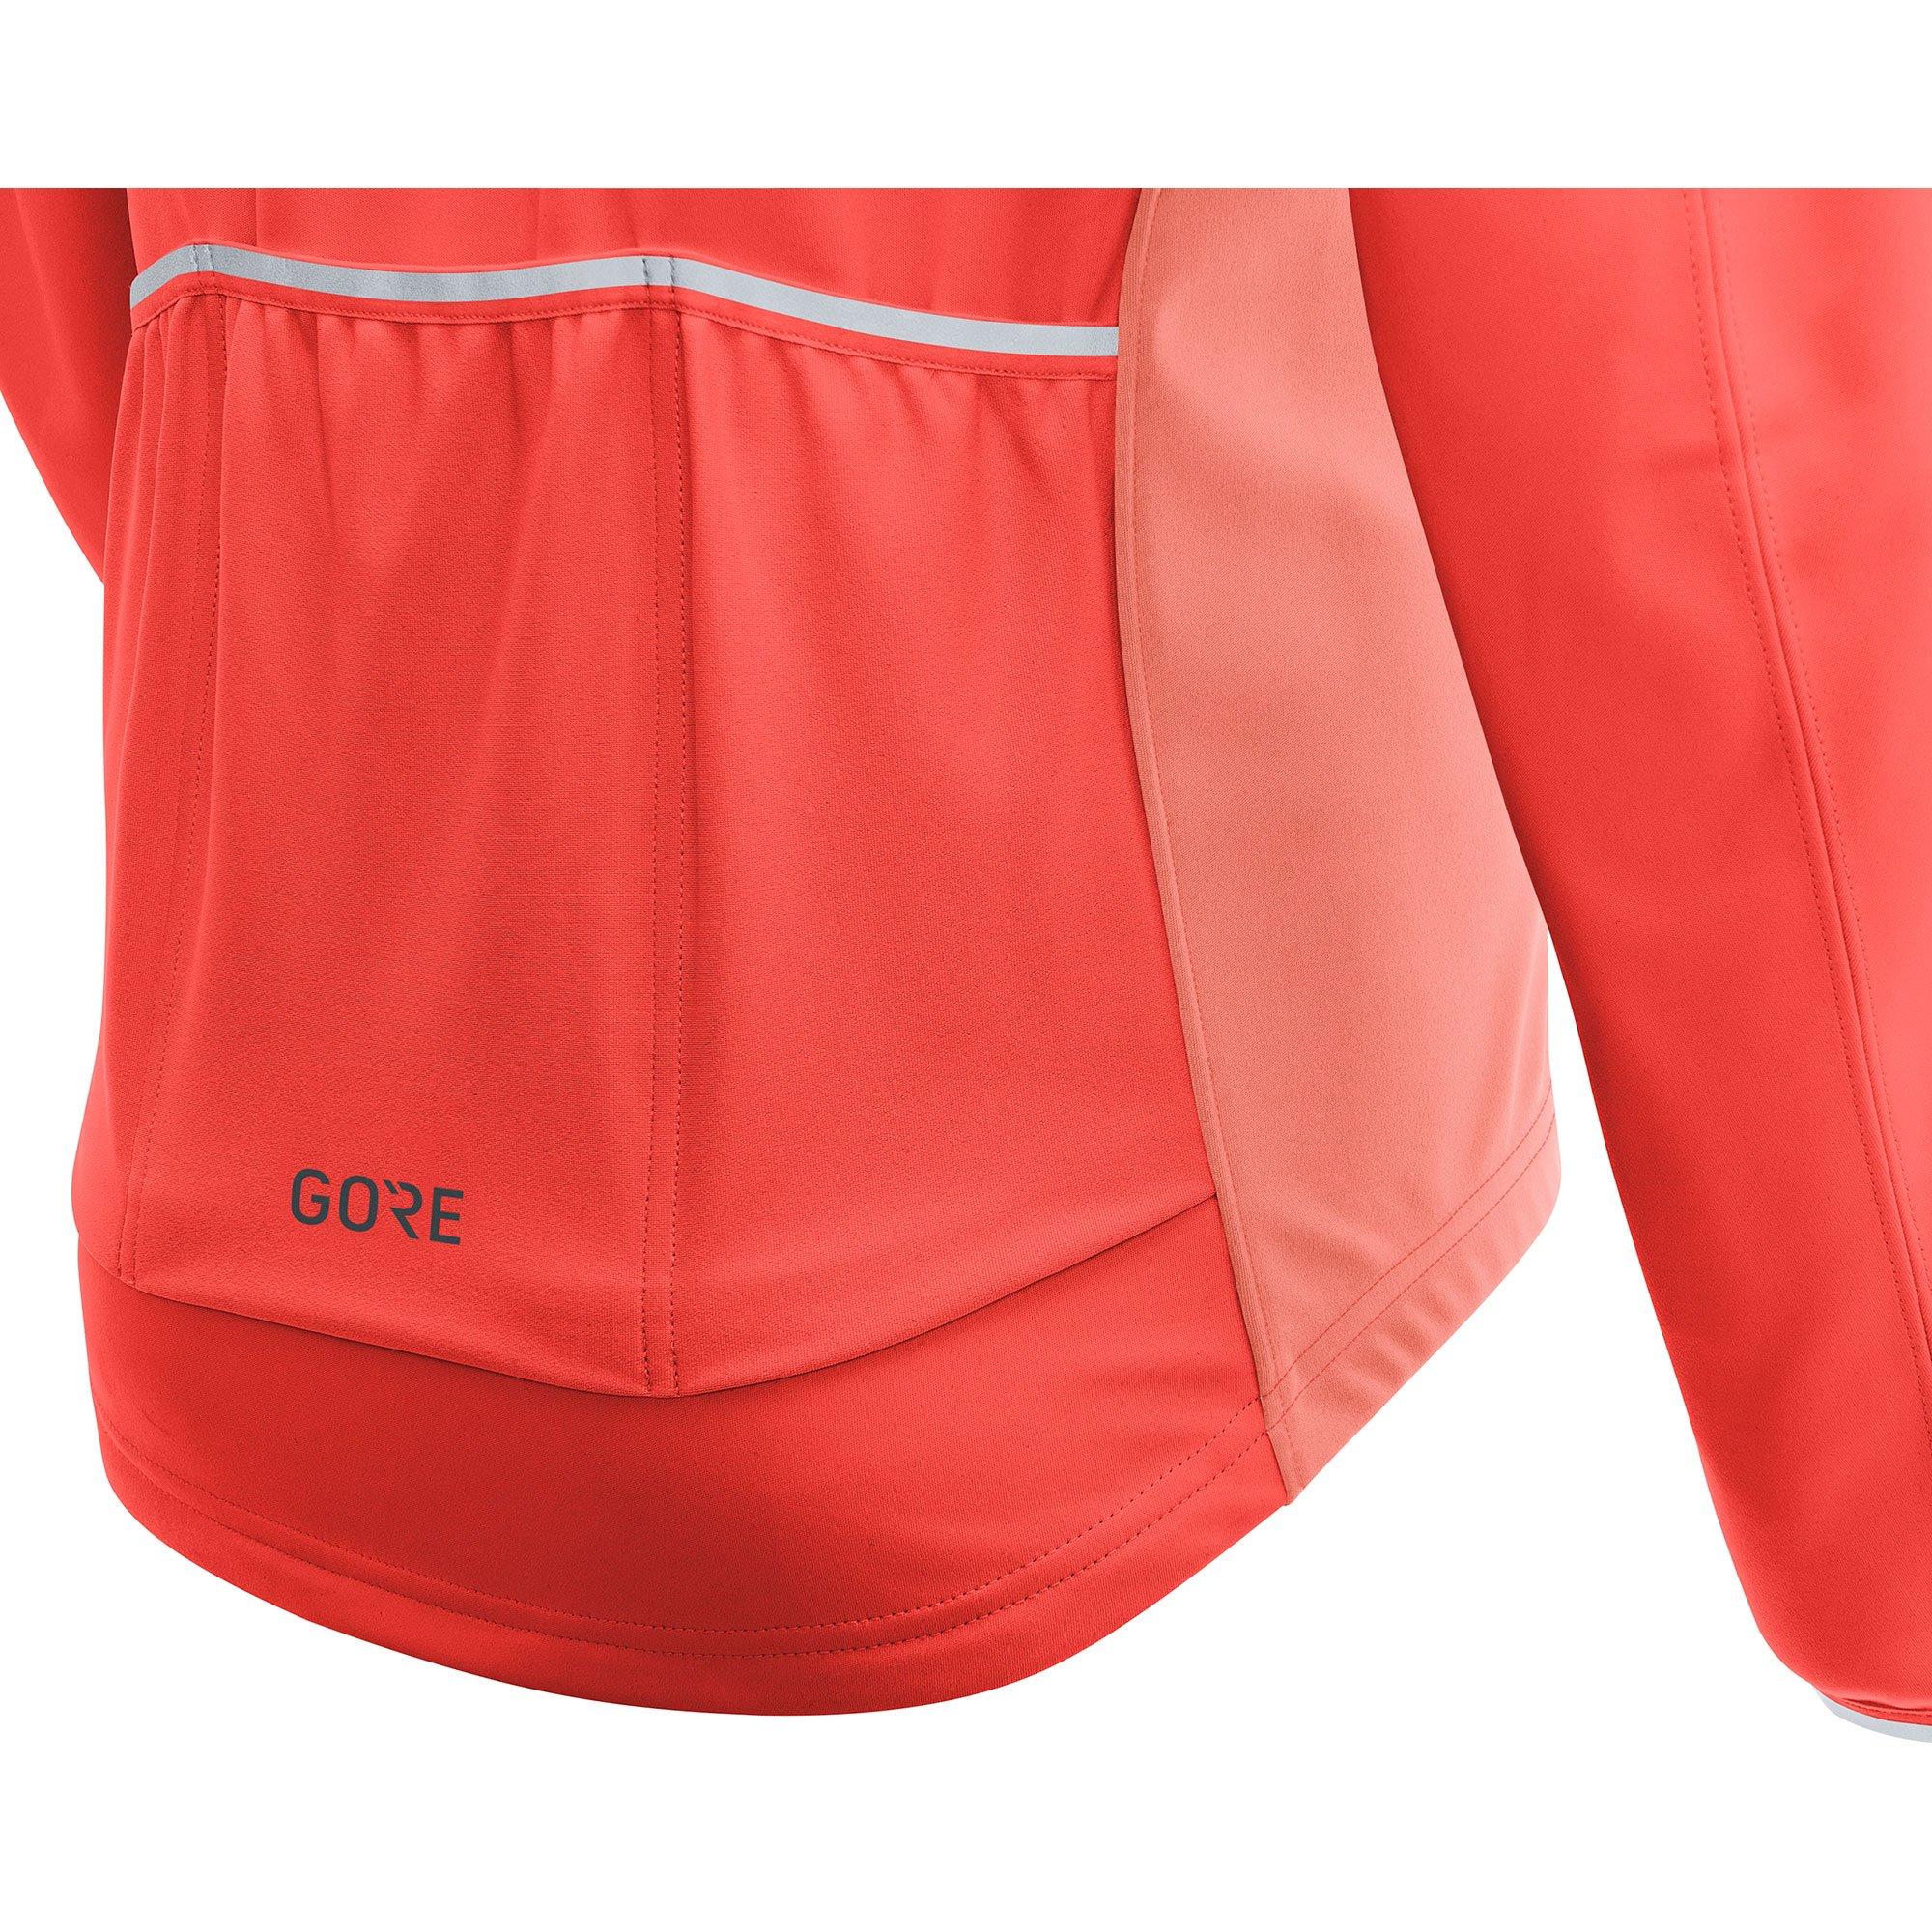 GORE Wear Women's Windproof Cycling Jacket, Removable Sleeves, GORE Wear C3 Women's GORE Wear WINDSTOPPER Phantom Zip-Off Jacket, Size: L, Color: Lumi Orange/Coral Glow, 100191 by GORE WEAR (Image #8)